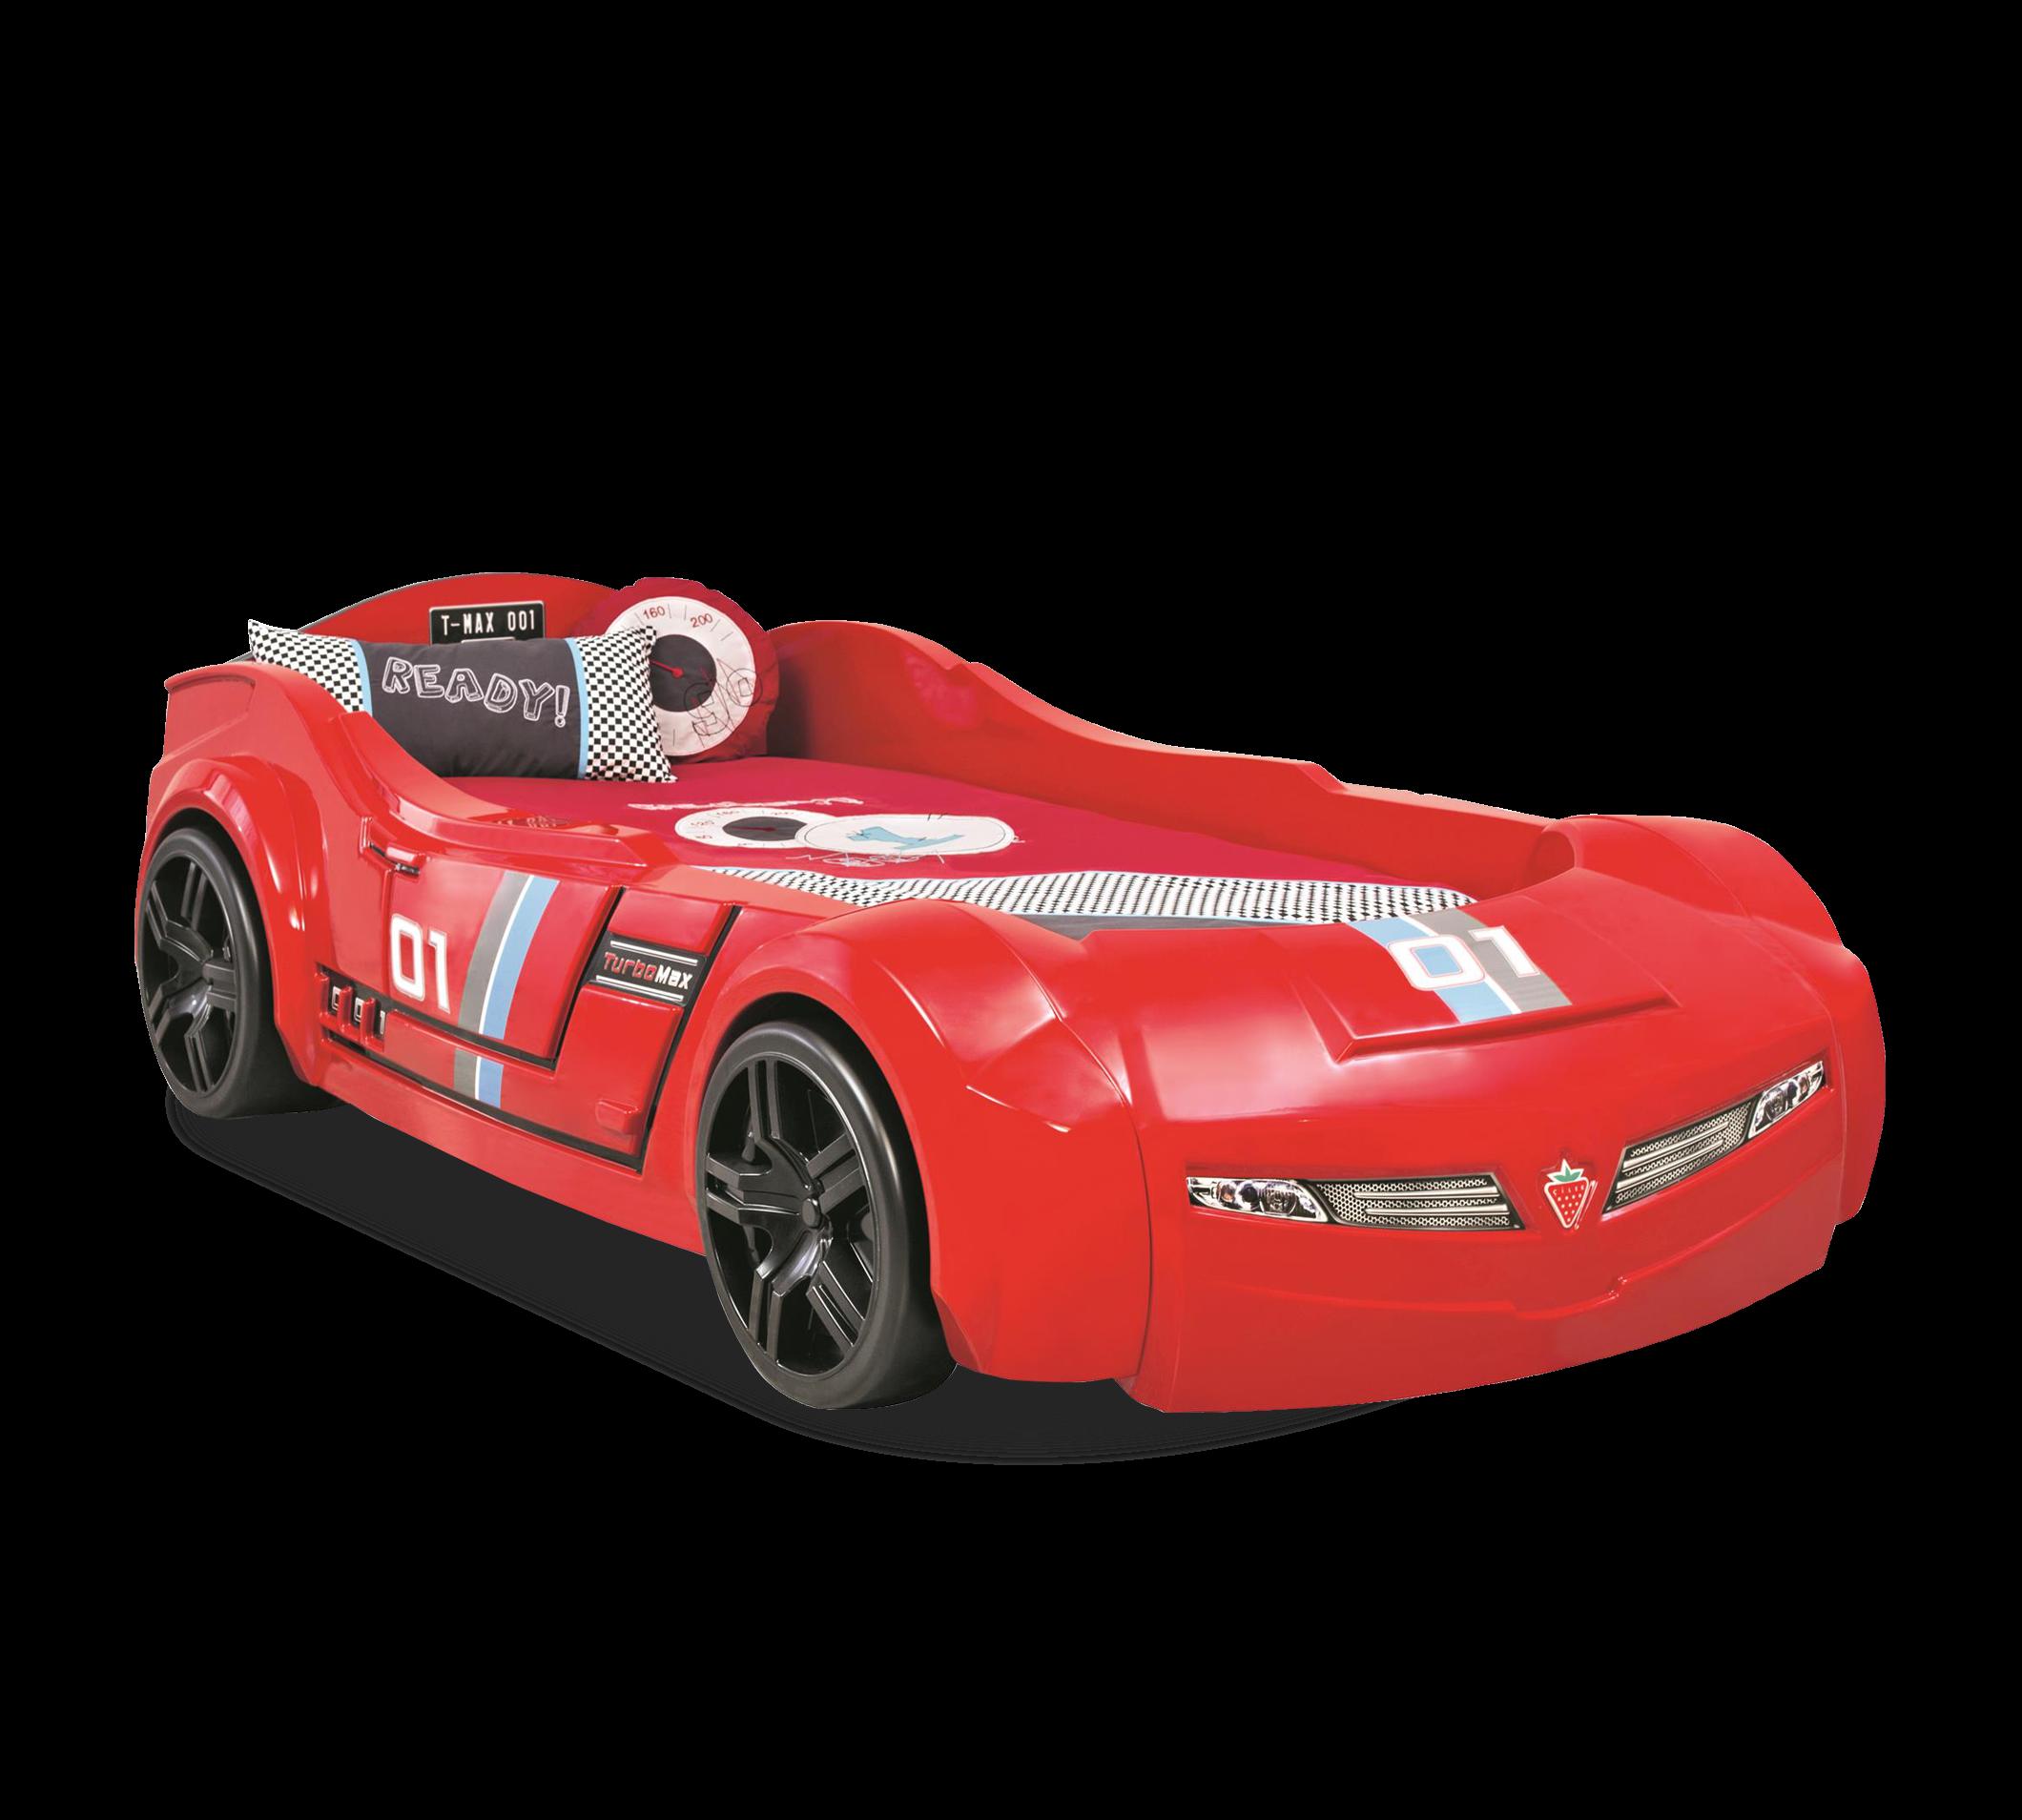 Pat din pal pentru copii Turbomax Red, 195 x 90 cm